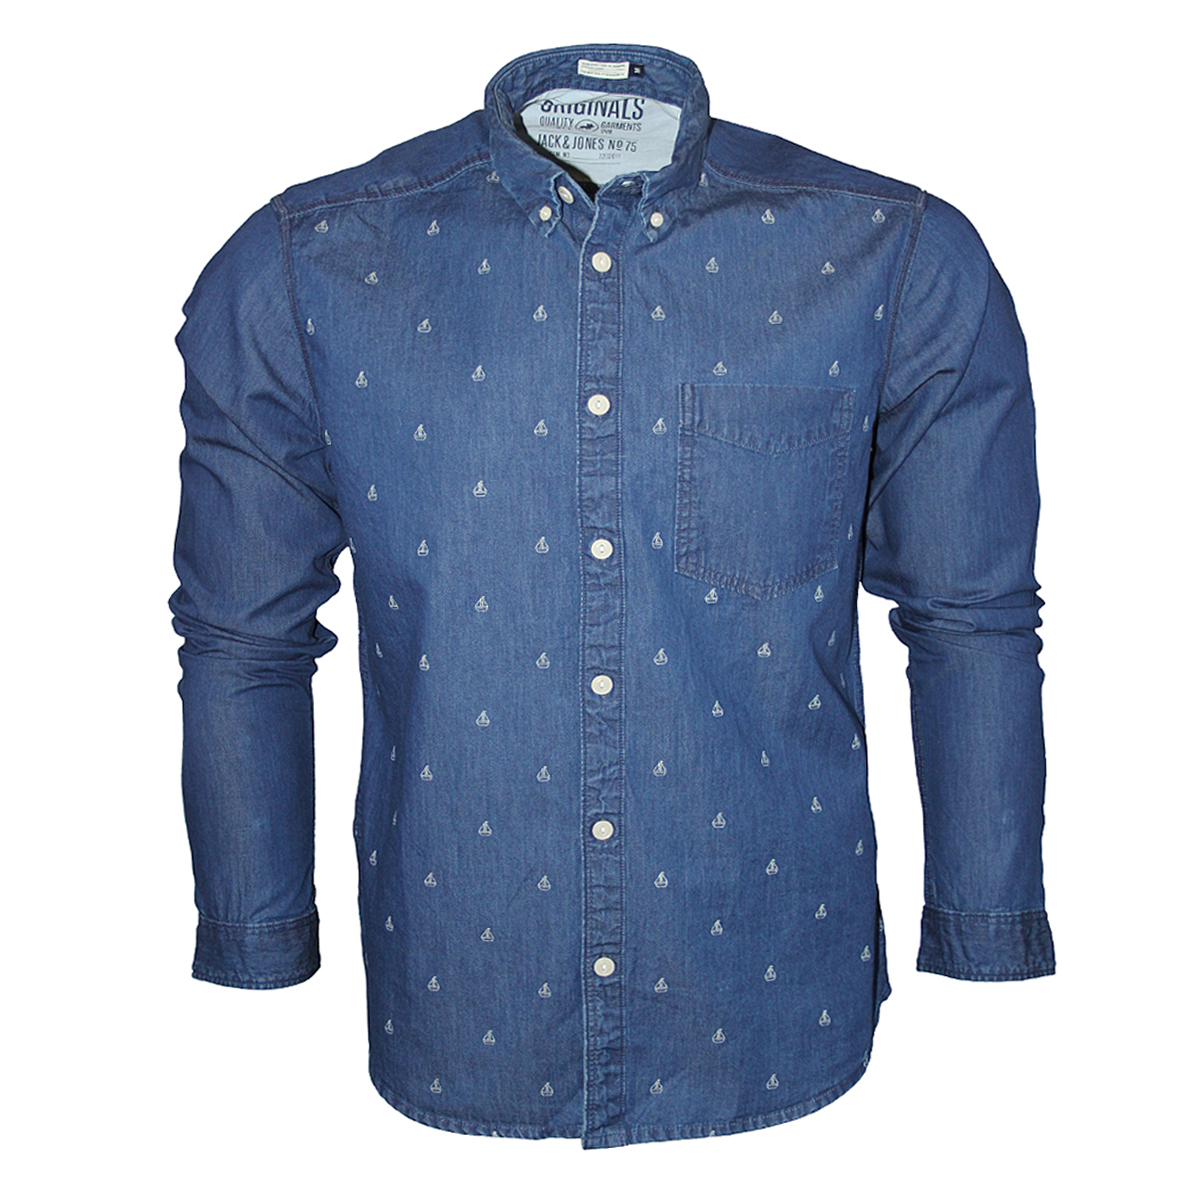 New Mens Denim Jack Amp Jones Jeans Robin Long Sleeved Slim Fit Shirt Sizes S Xxl Ebay